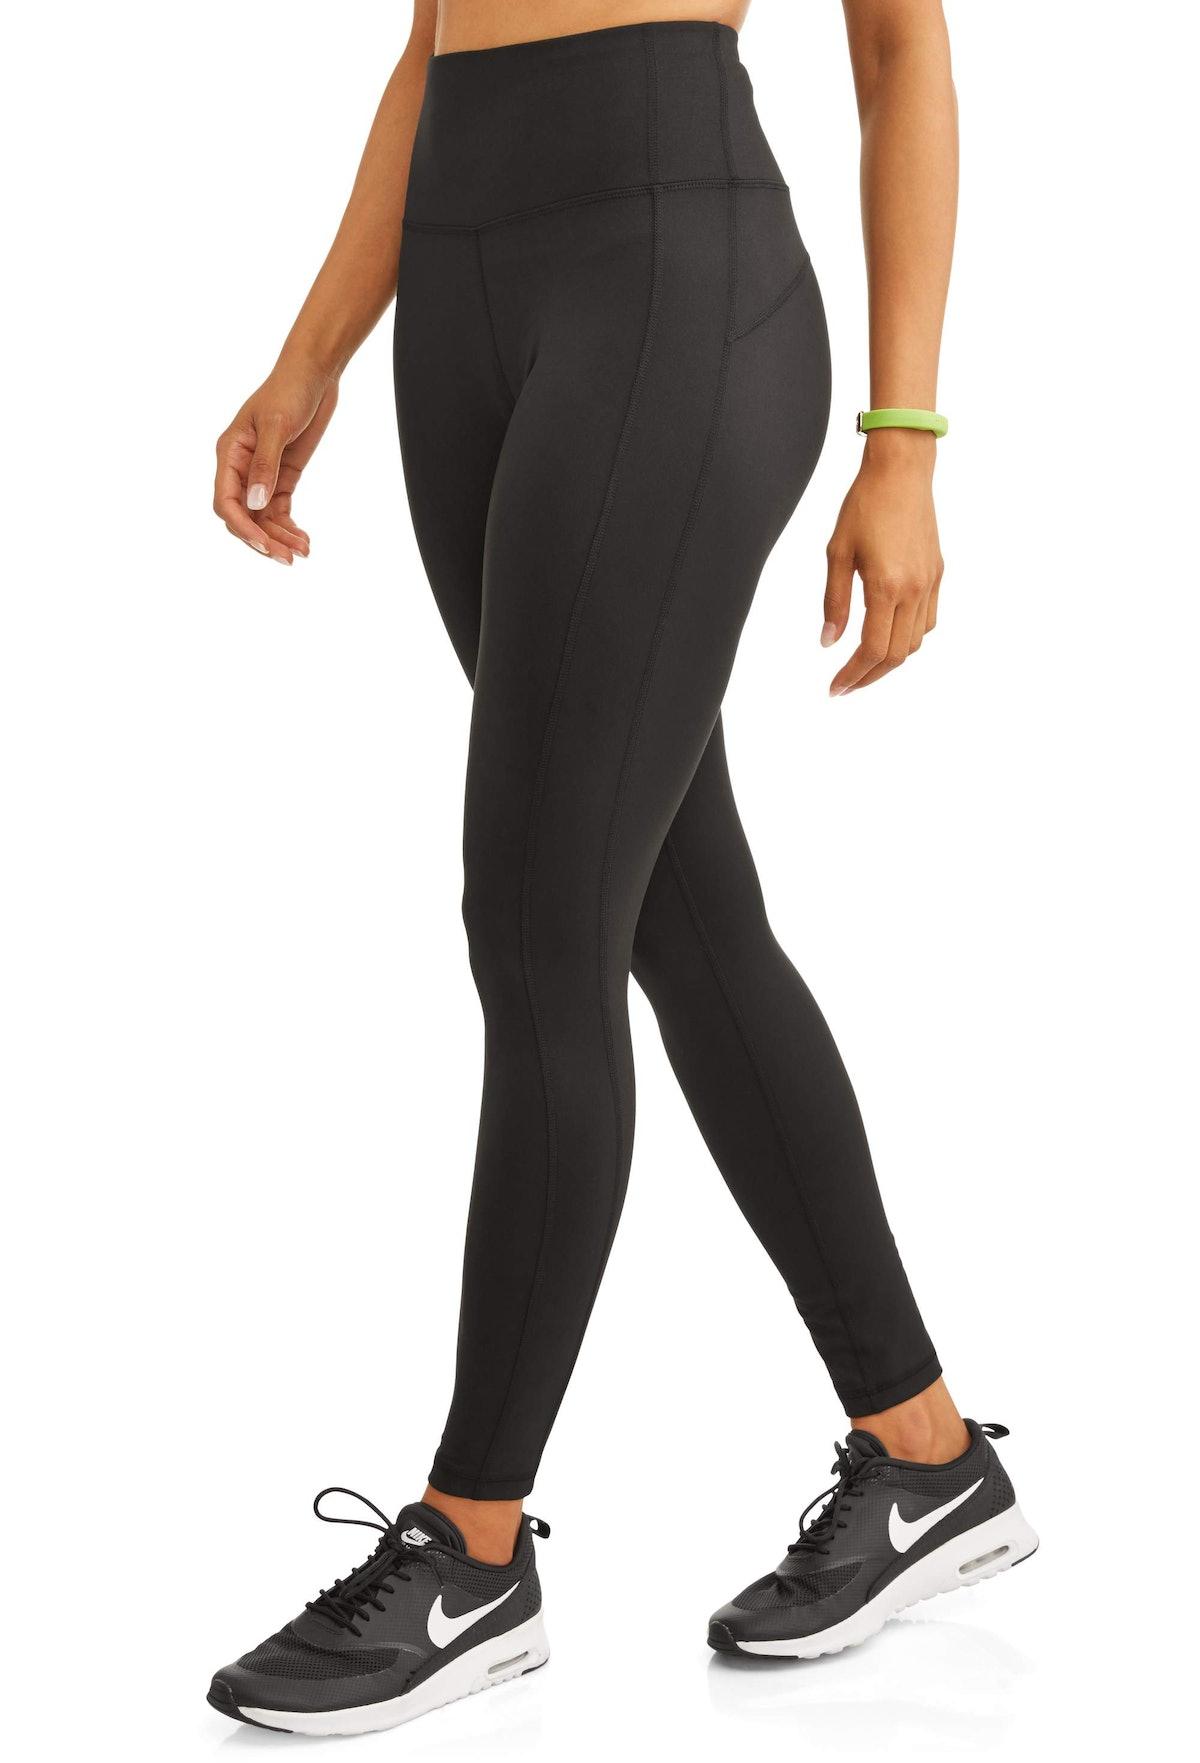 Avia Women's Active High Rise Performance Legging